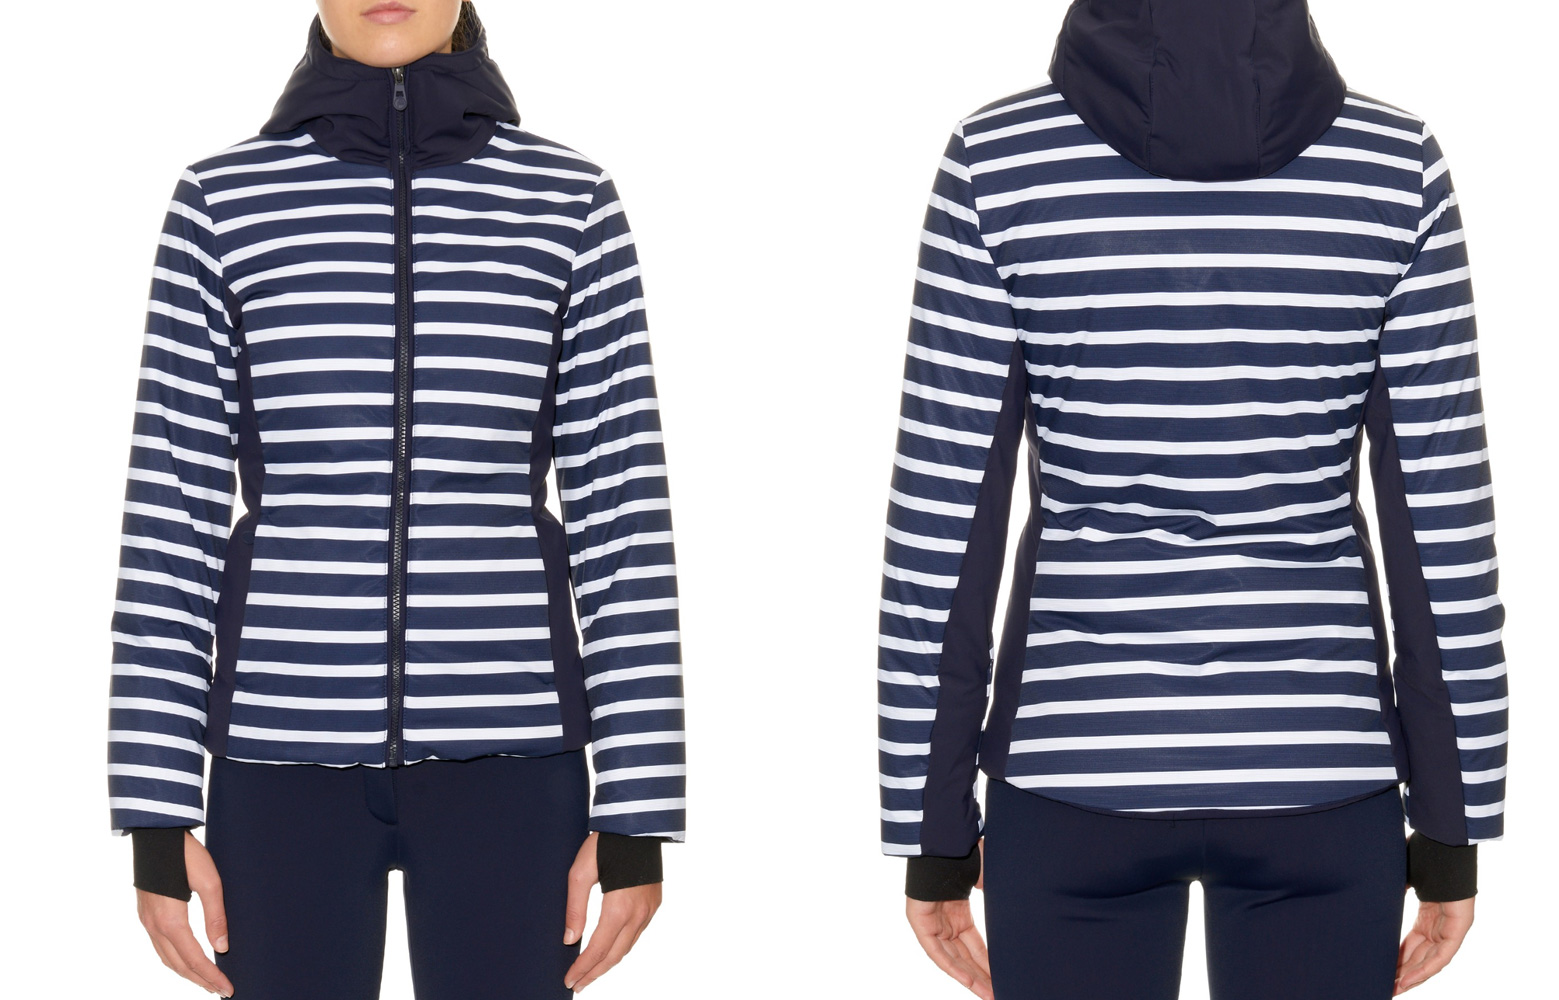 Ski jacket inspiration